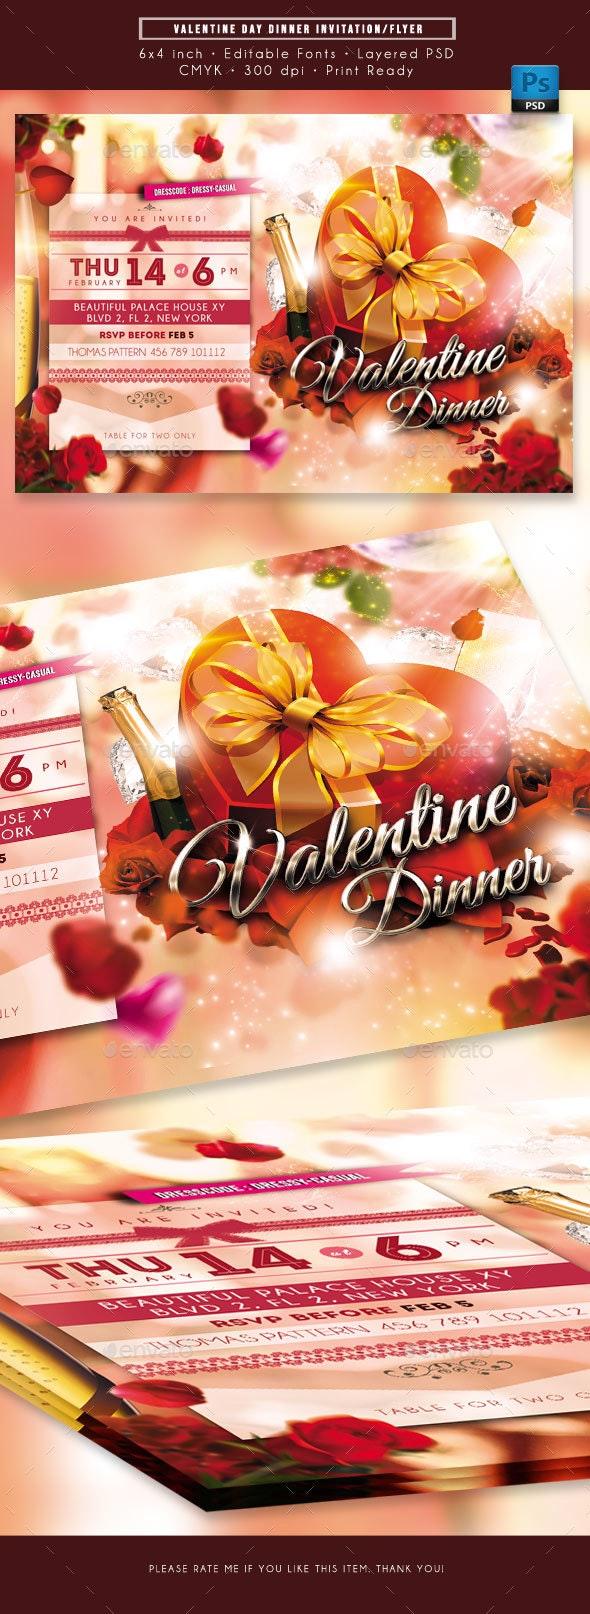 Valentine Day Dinner Invitation - Invitations Cards & Invites